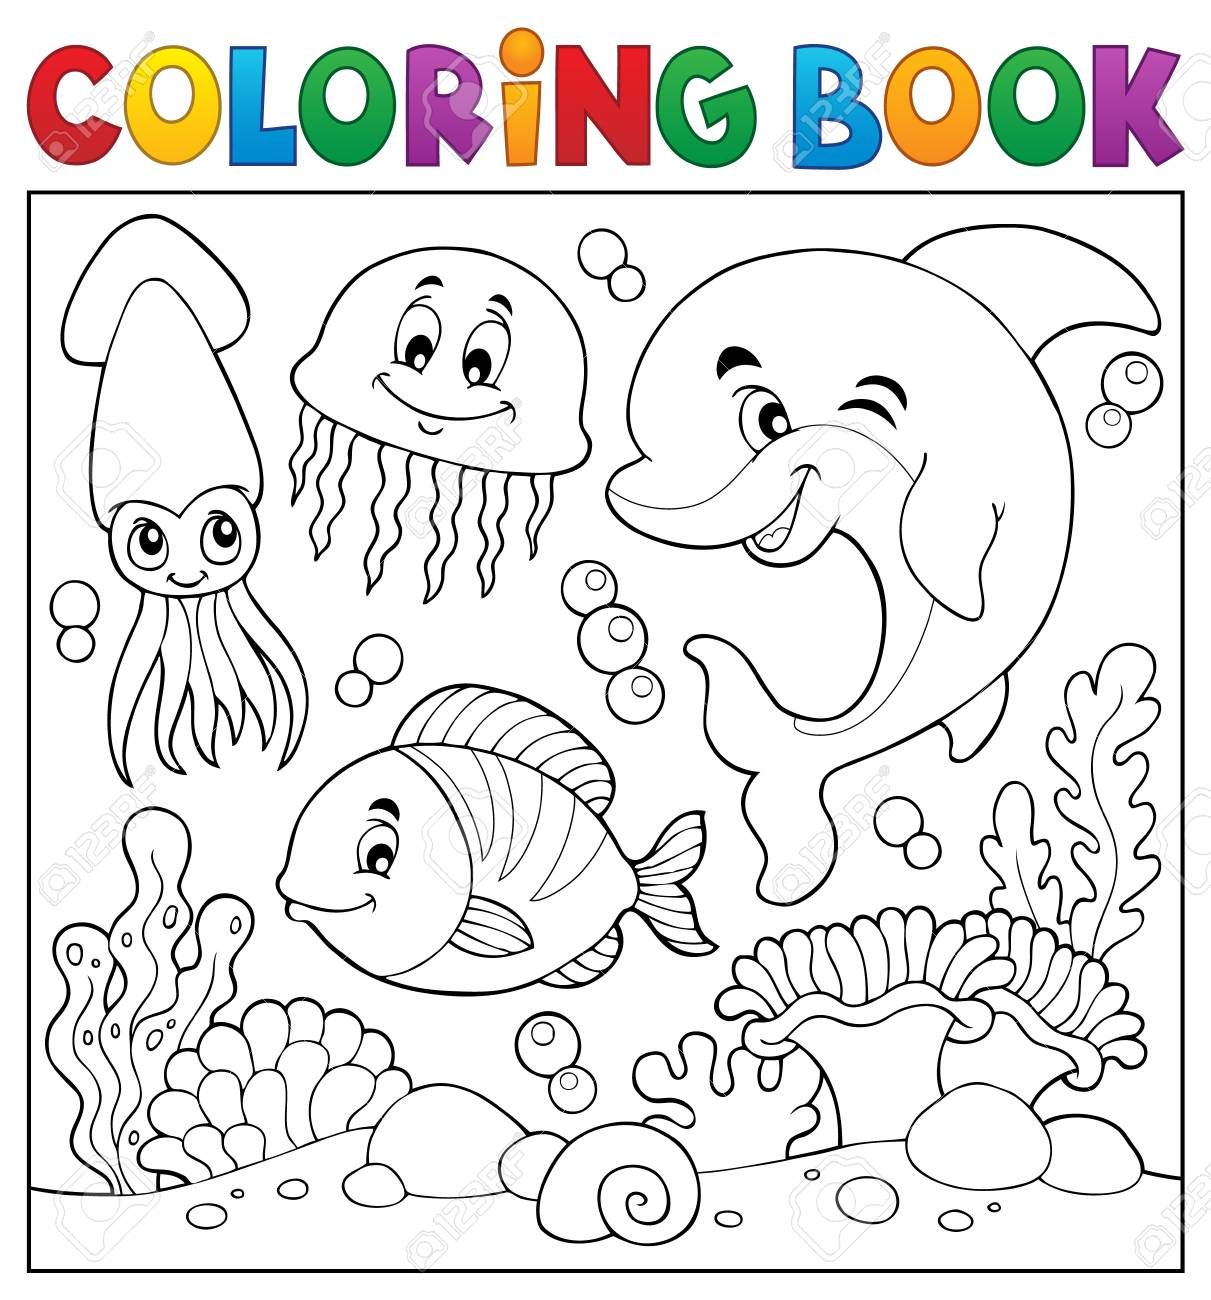 Coloring book sea life theme - 104699968